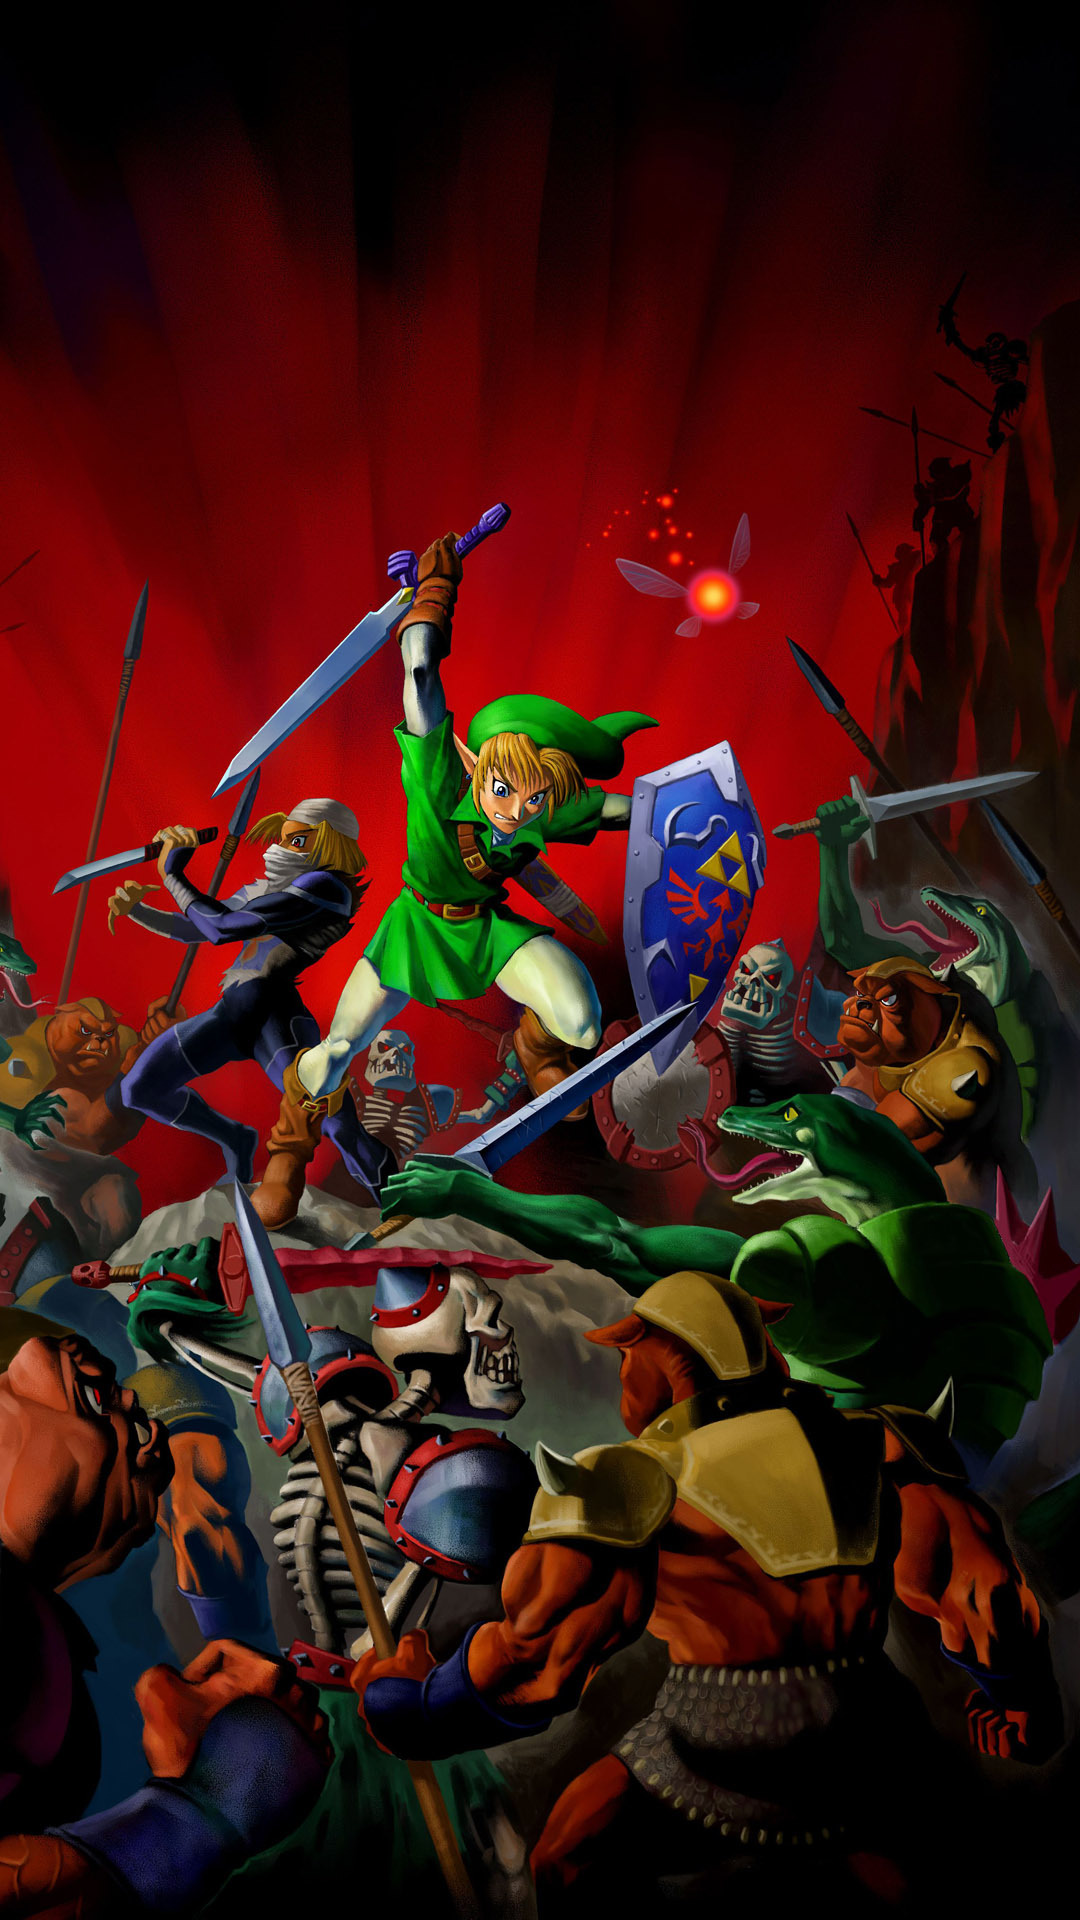 Free Download Hd Legend Of Zelda Link Mobile Phone Wallpapers